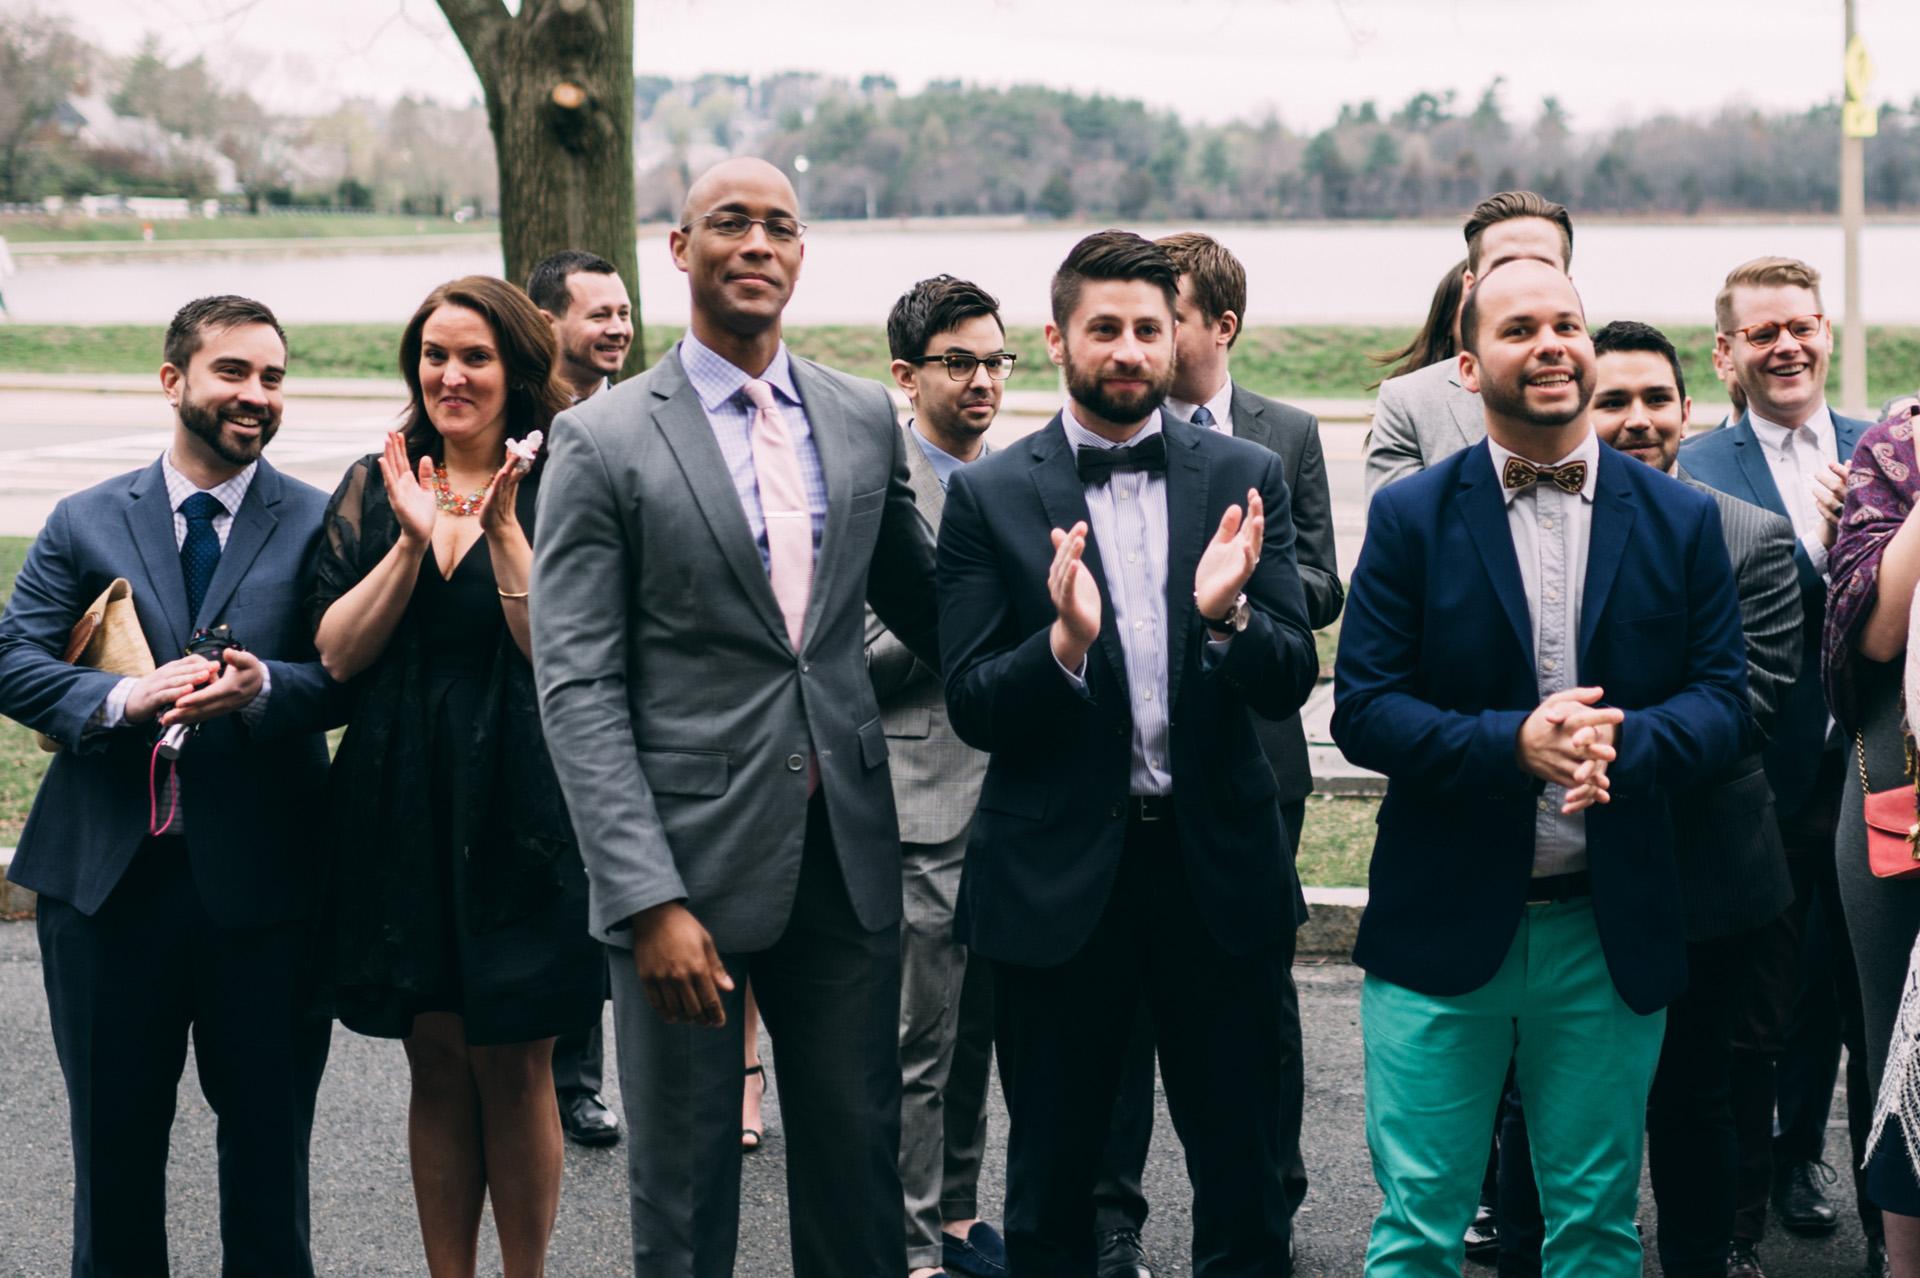 boston-waterworks-museum-wedding-44